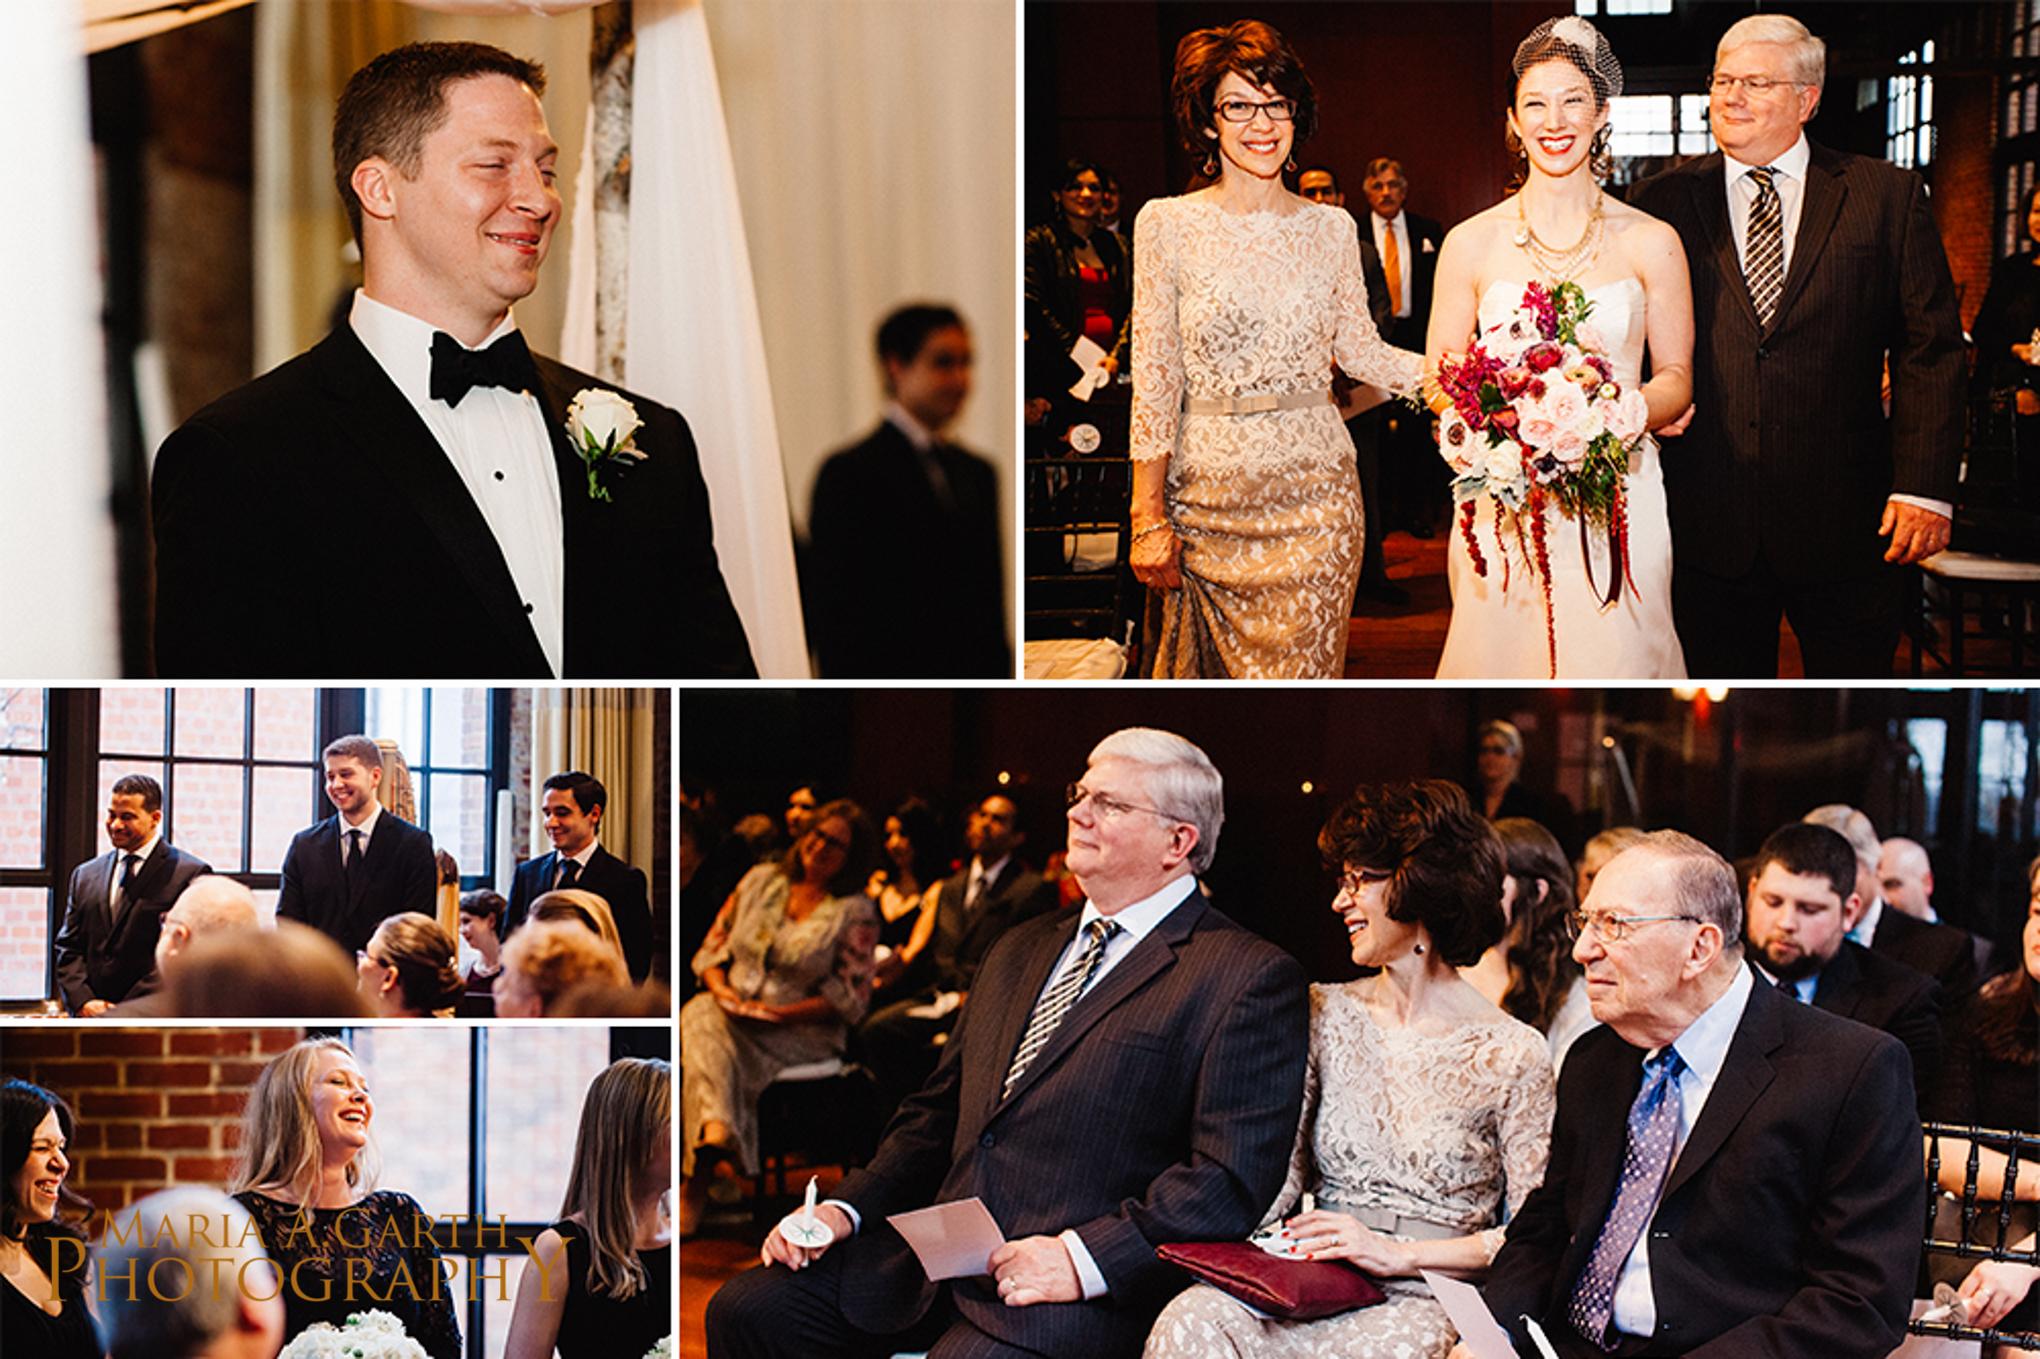 Georgetown Weddings, DC Wedding Photography, Weddings at the Ritz in DC_017.jpg